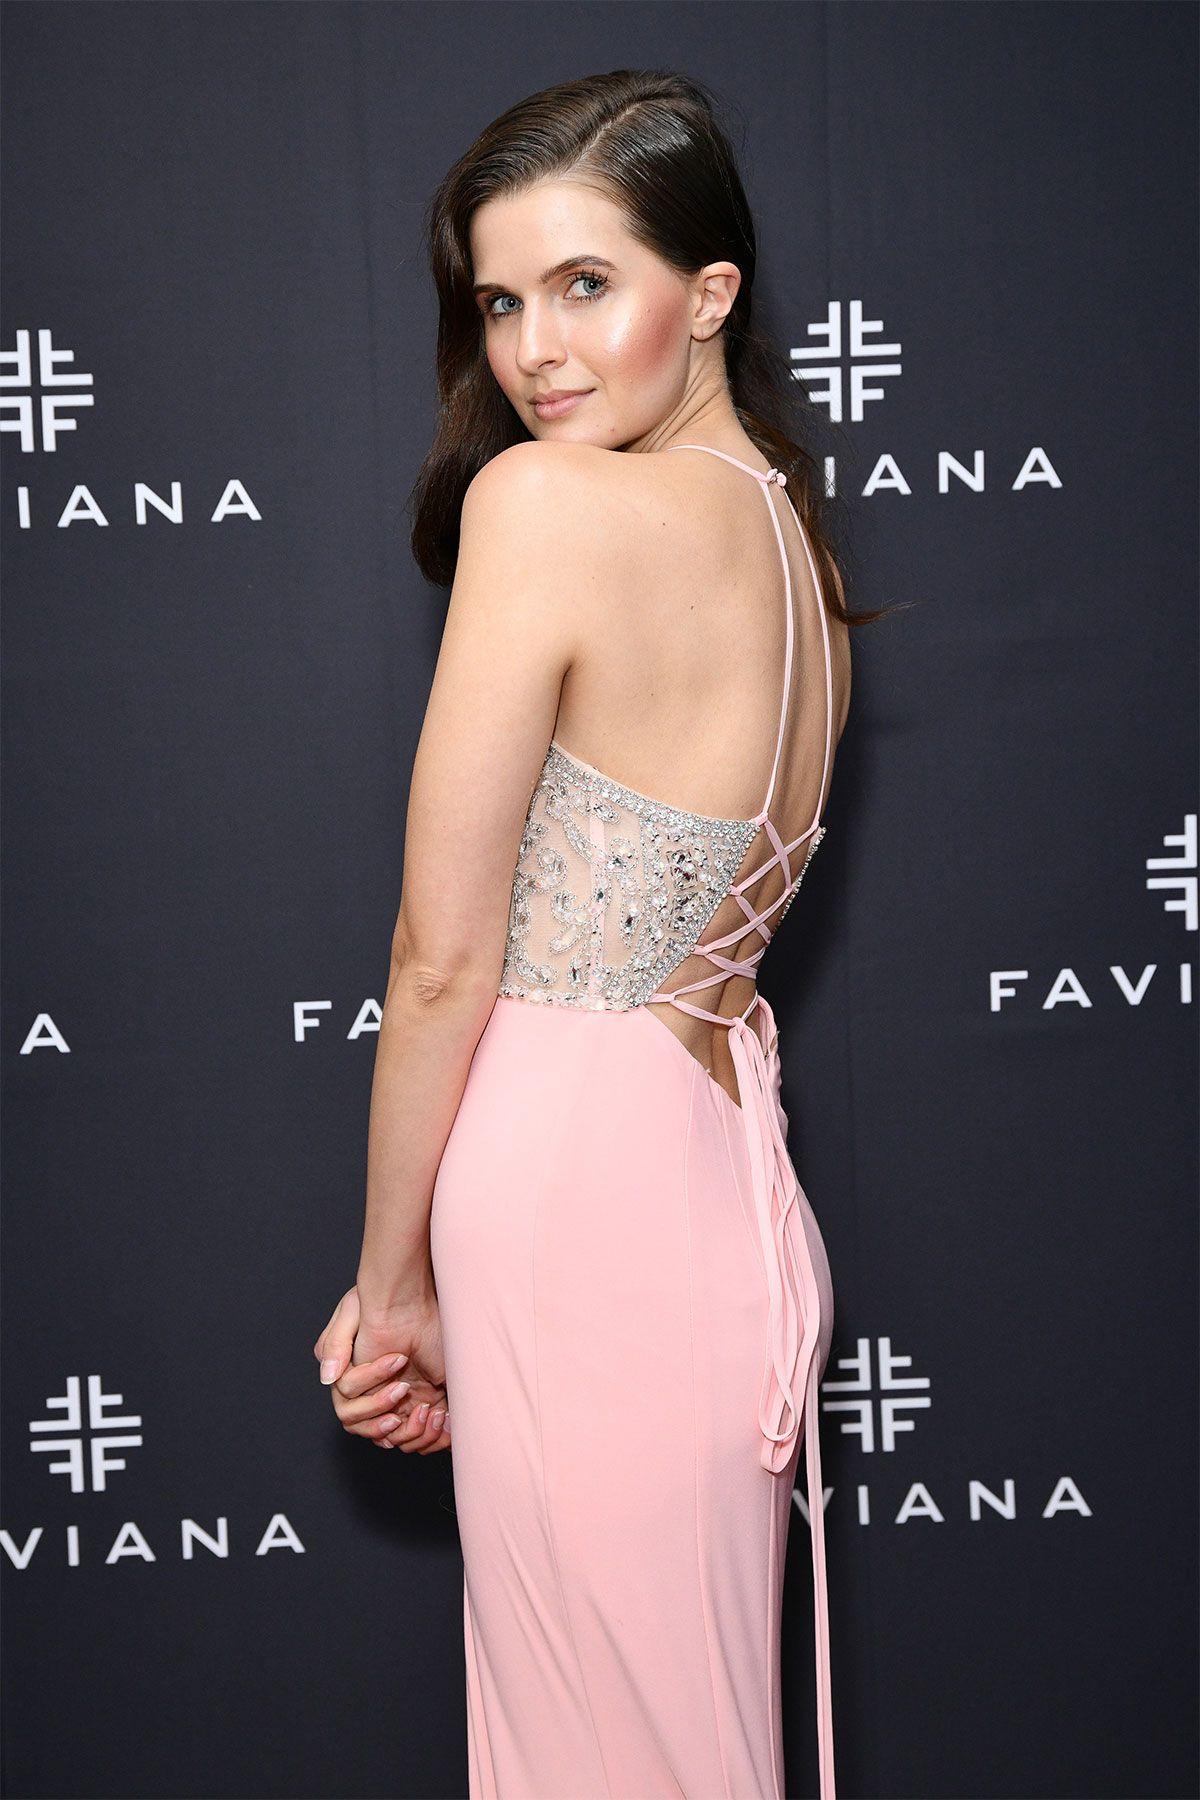 TomcatWallpapers: Best Hollywood Celebrity Dresses of 2012